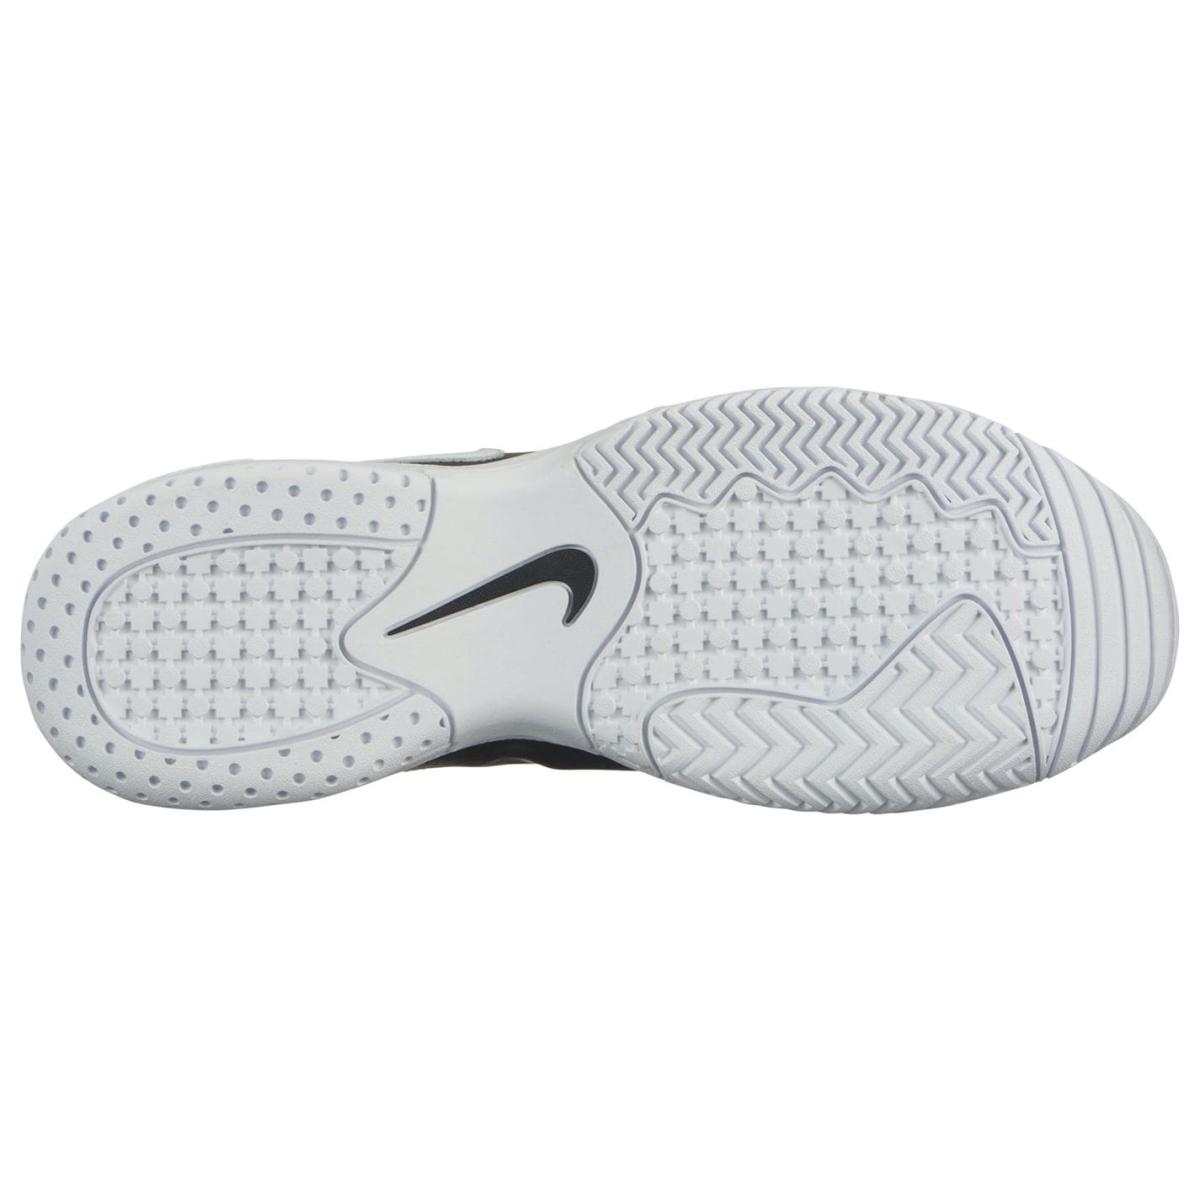 Nike Court Lite 2 Herren Turnschuhe Sportschuhe Sneaker Laufschuhe Casual 5224